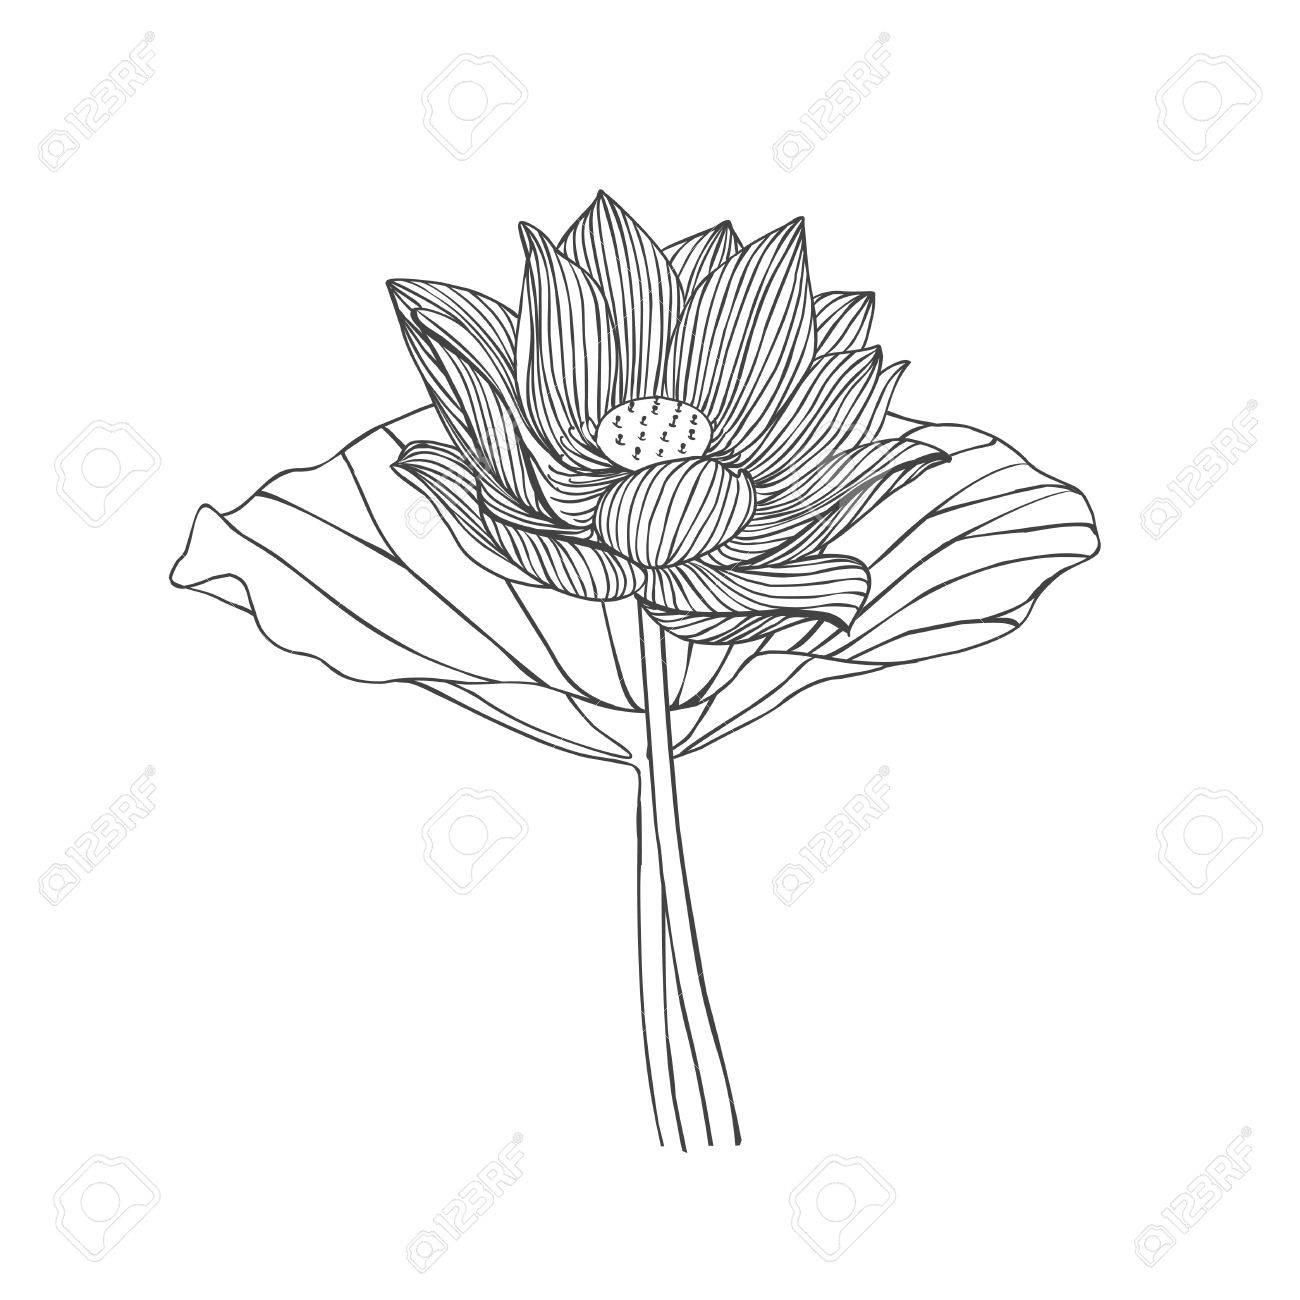 Lotus Leaf Drawing At Getdrawings Free For Personal Use Lotus